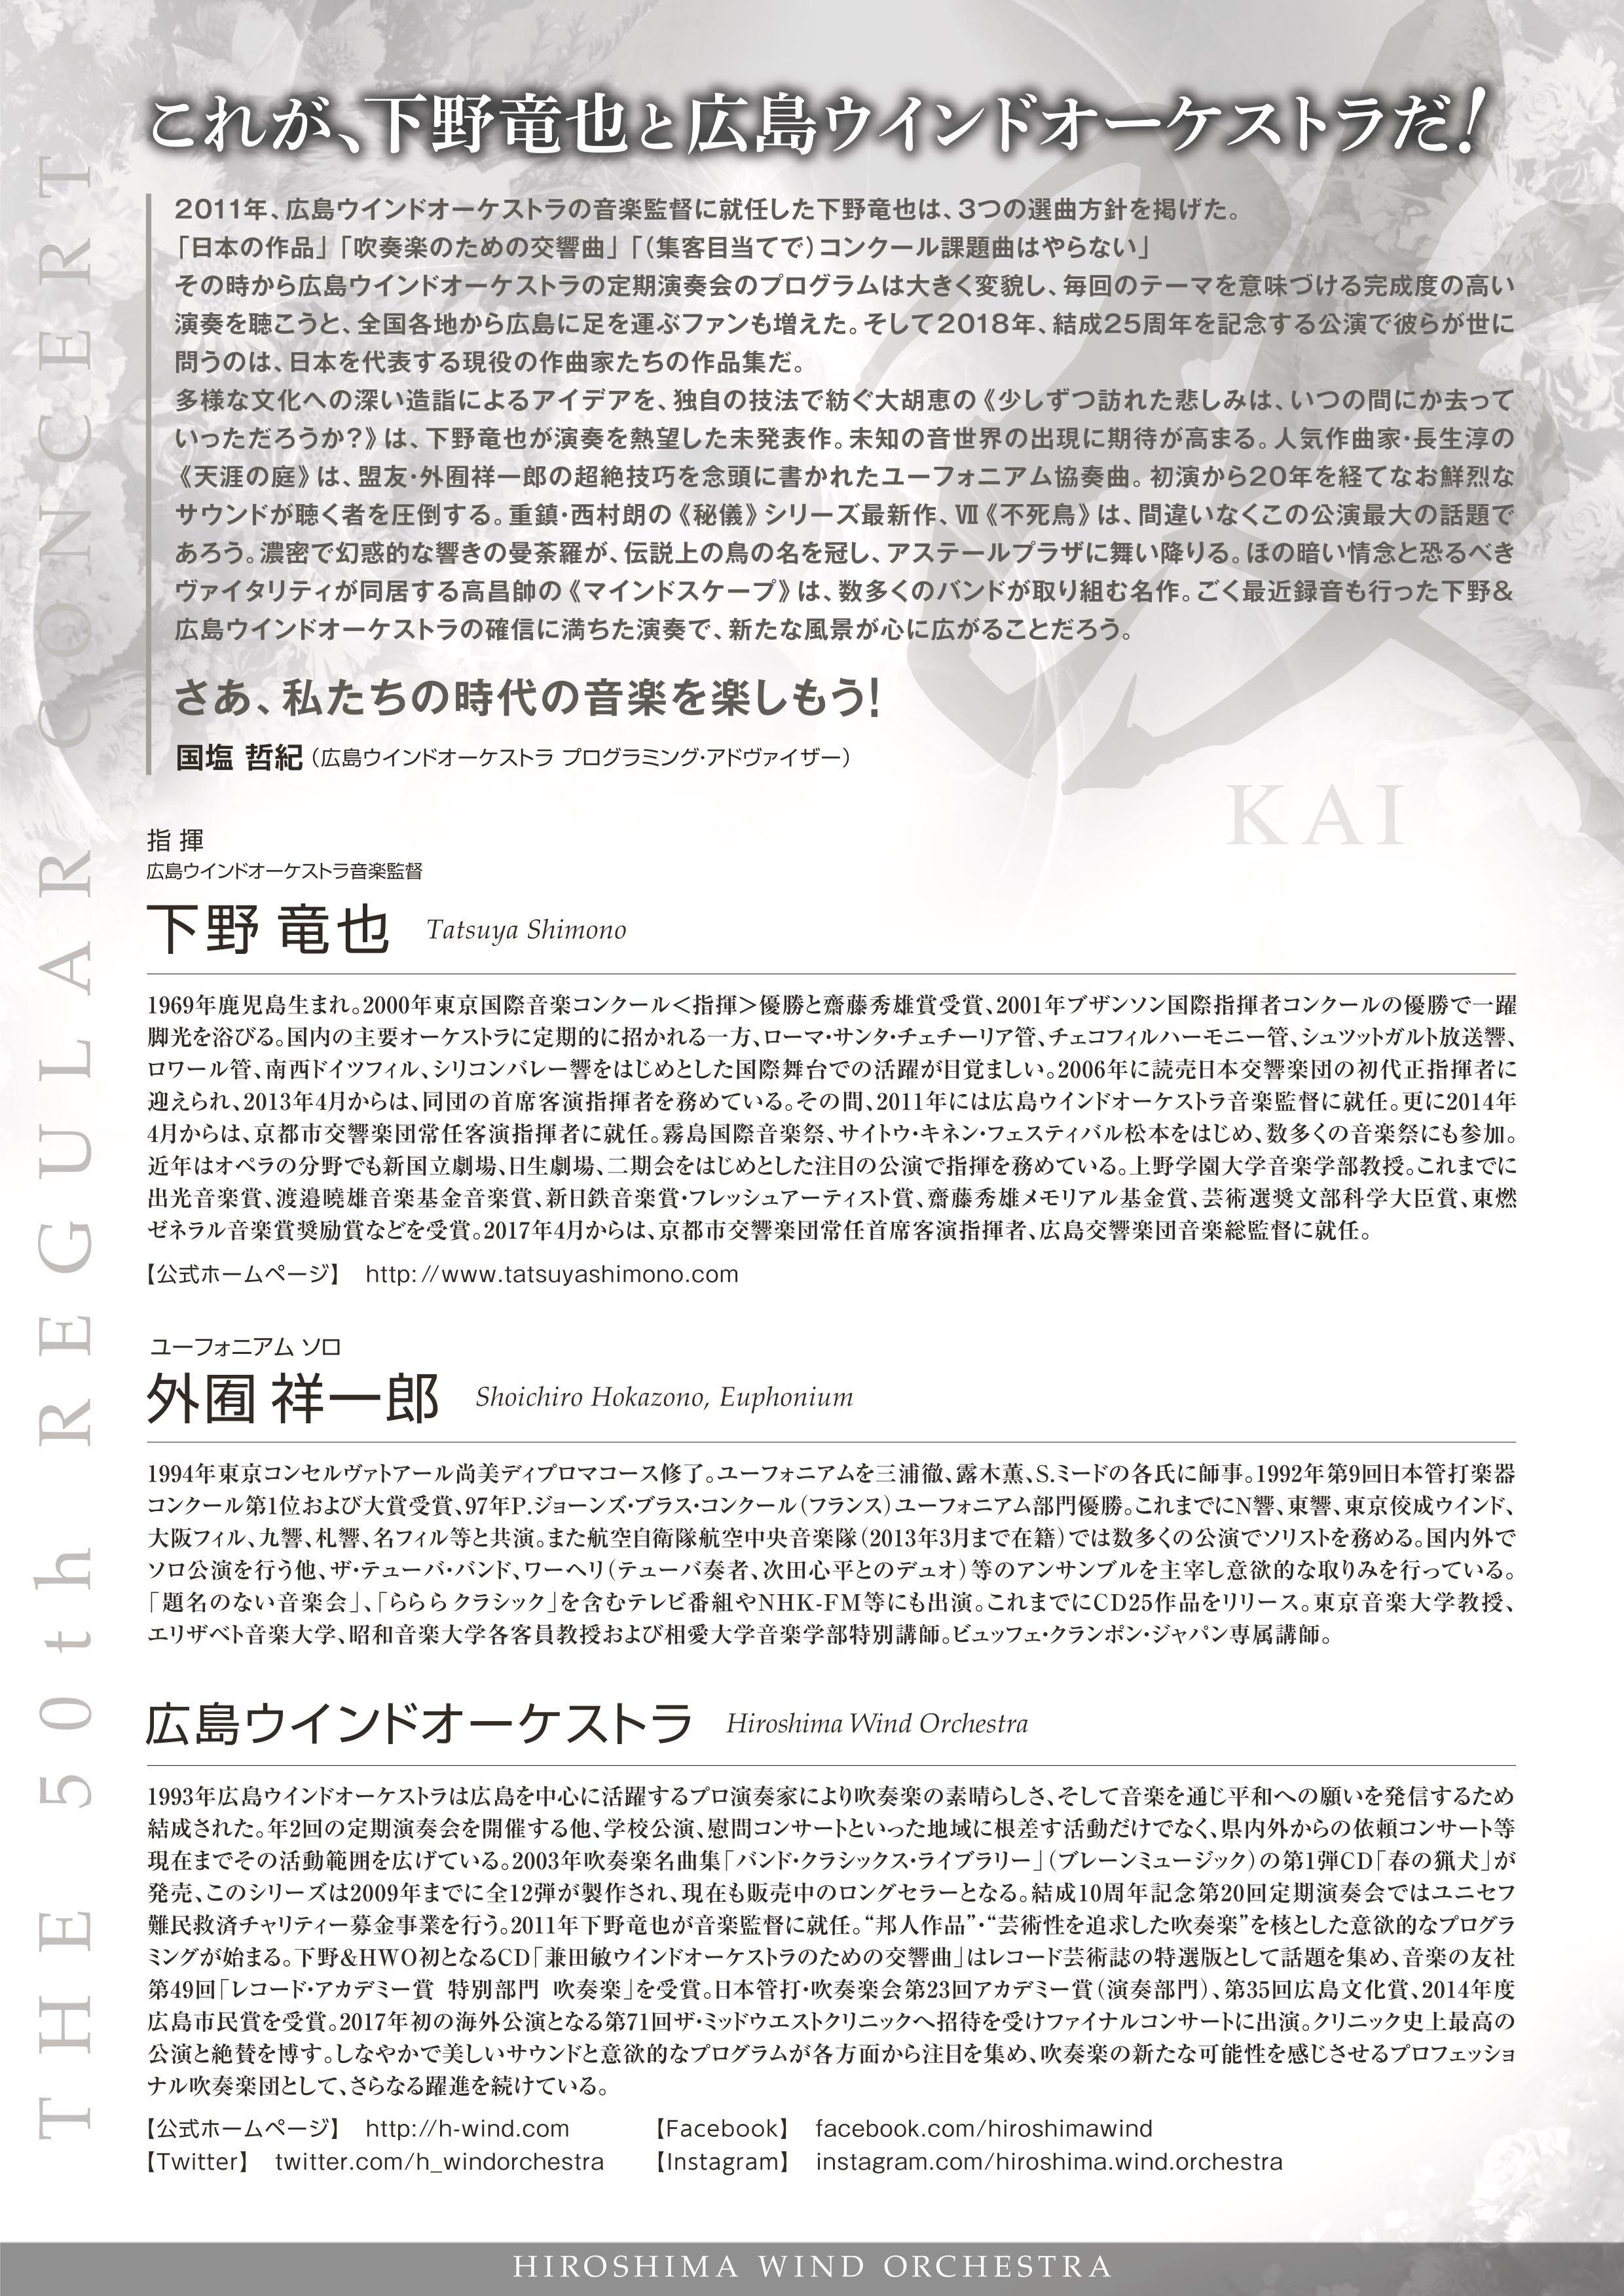 hwo.50hiroshima.u.jpg